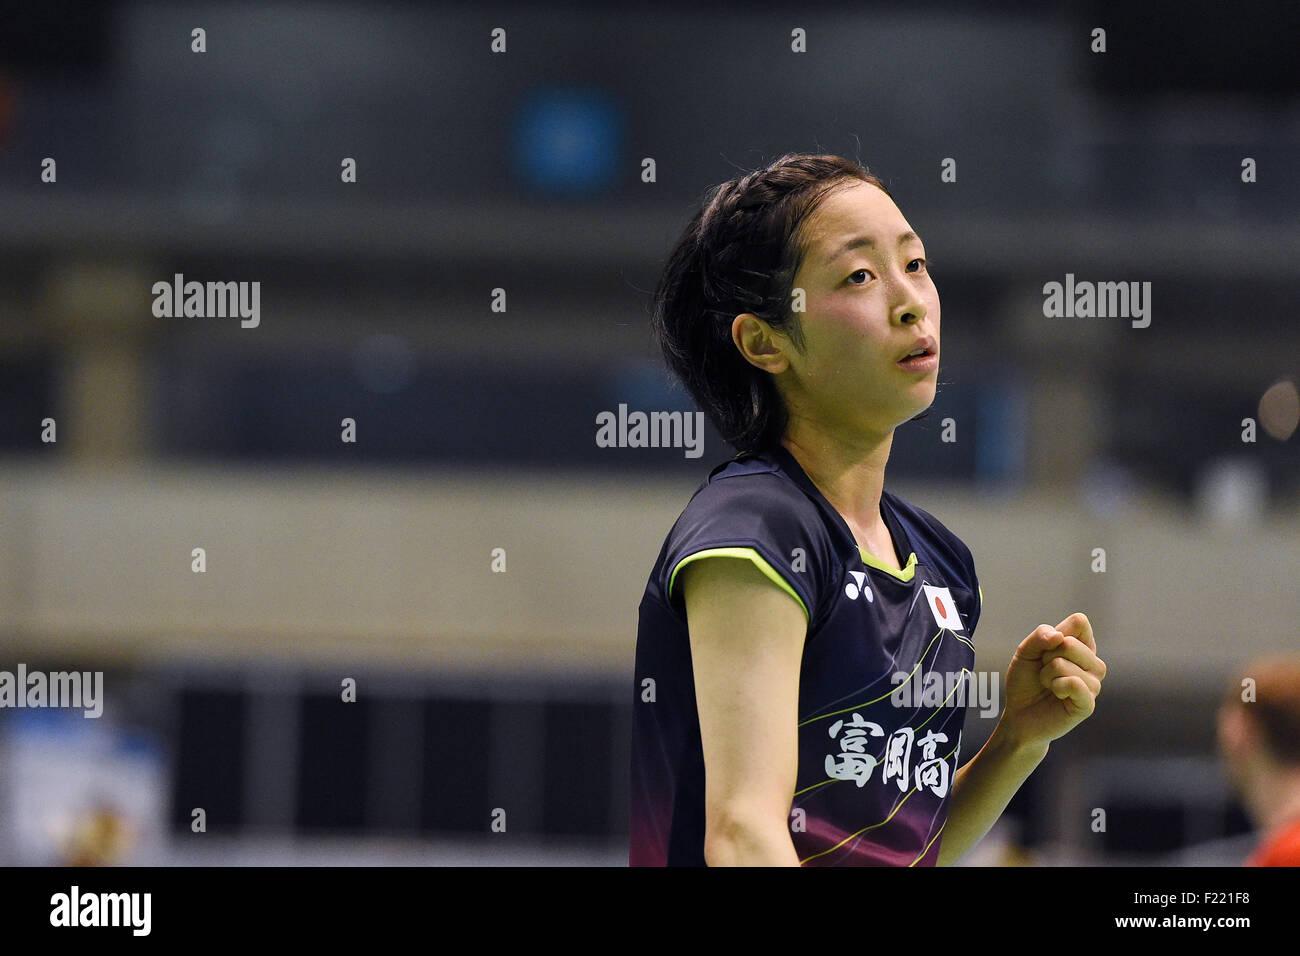 Tokyo Metropolitan Gymnasium Tokyo Japan 9th Sep 2015 Saena